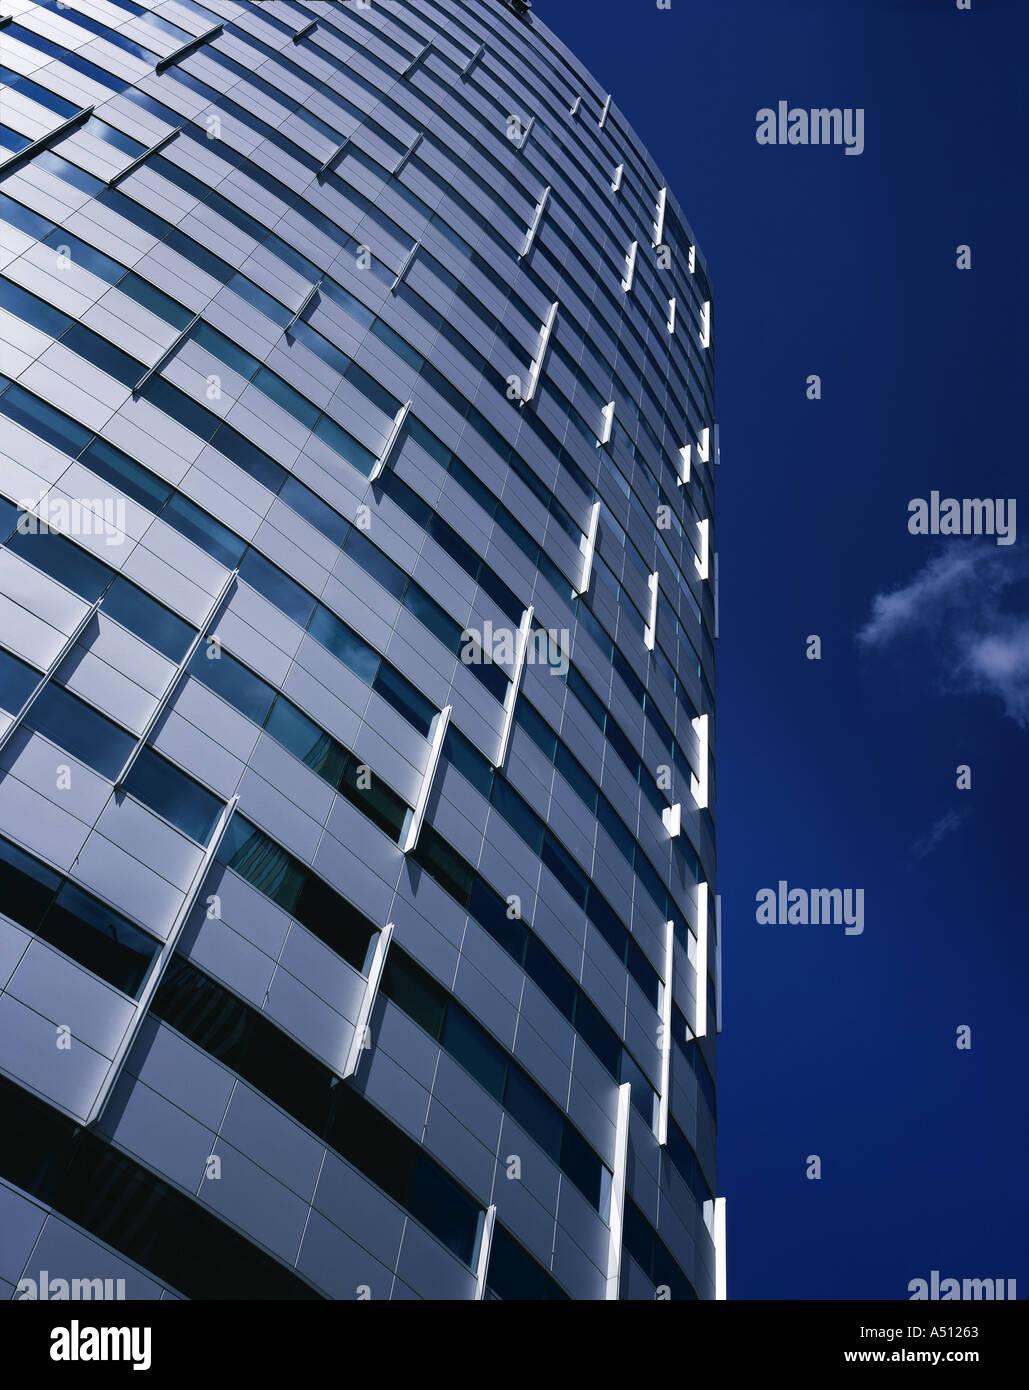 Oval-Tower-Komplex, Amsterdam Süd. Architekt: Skidmore, Owings and Merrill London (SOM) Stockbild